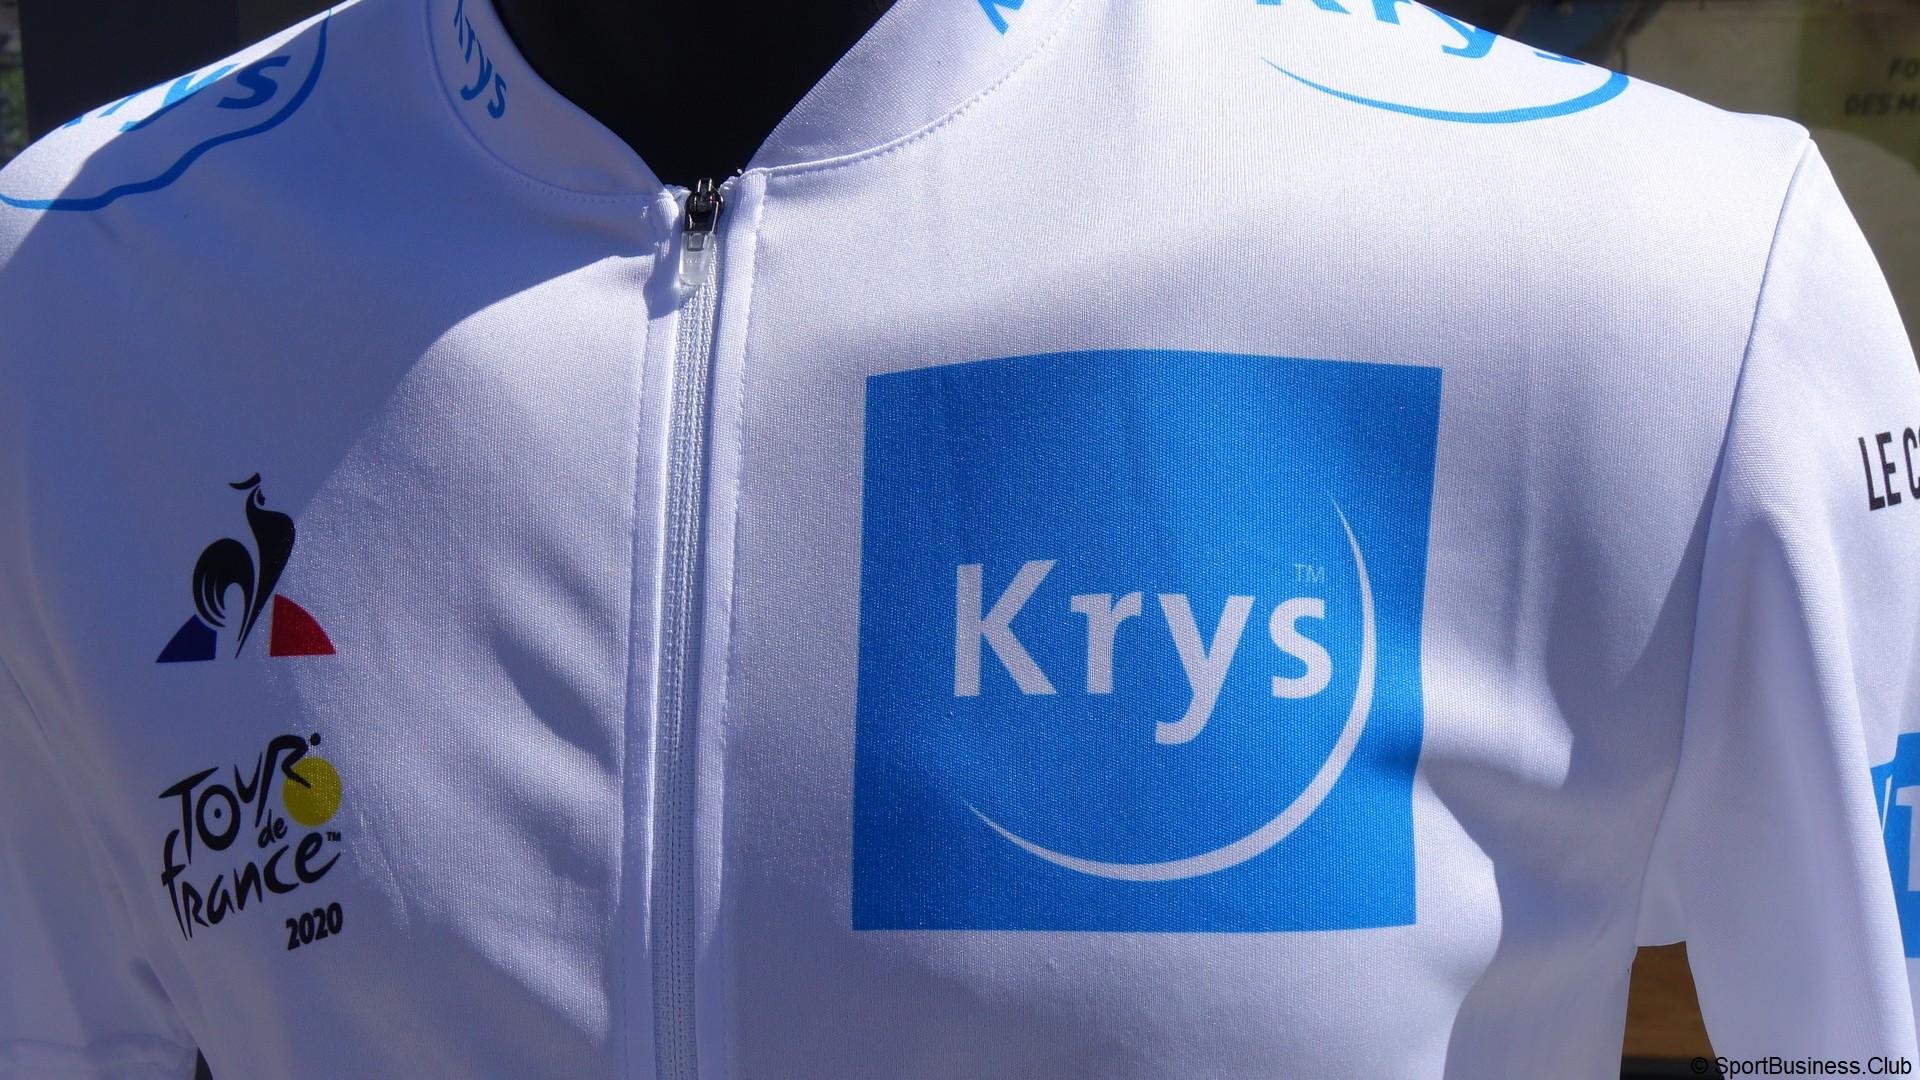 Krys x Tour de France (cyclisme) 2020